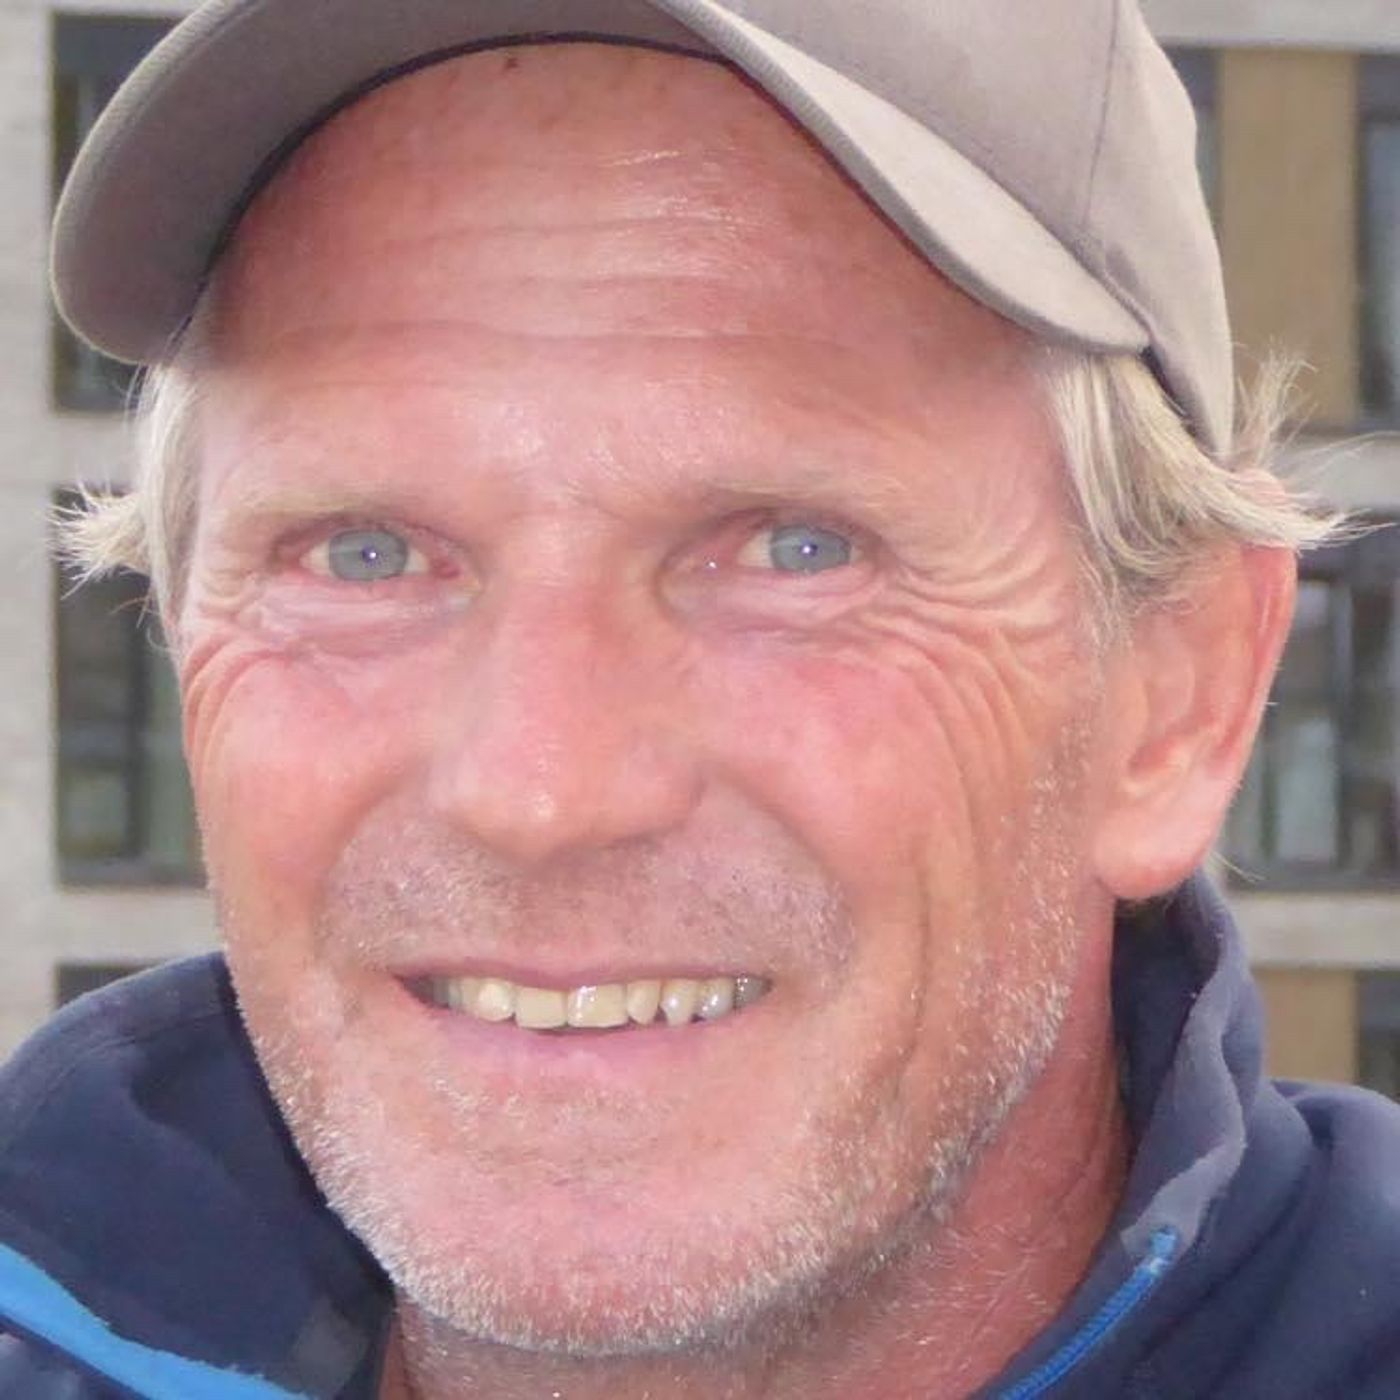 Martin fra Renskib om bådpleje - 16.2021